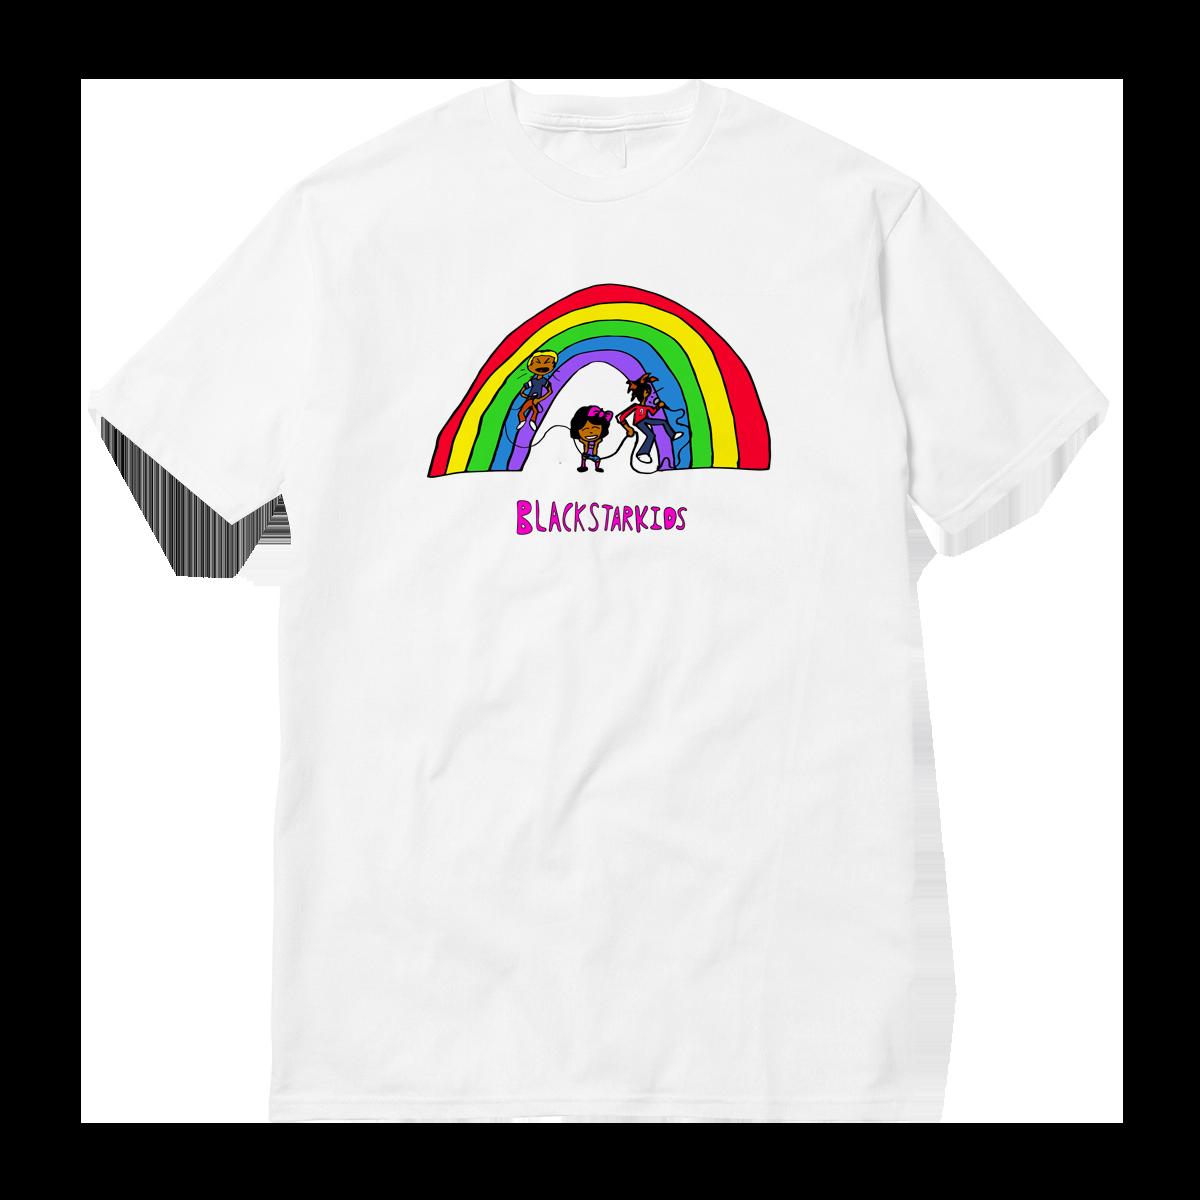 BLACKSTARKIDS: Rainbow T-Shirt